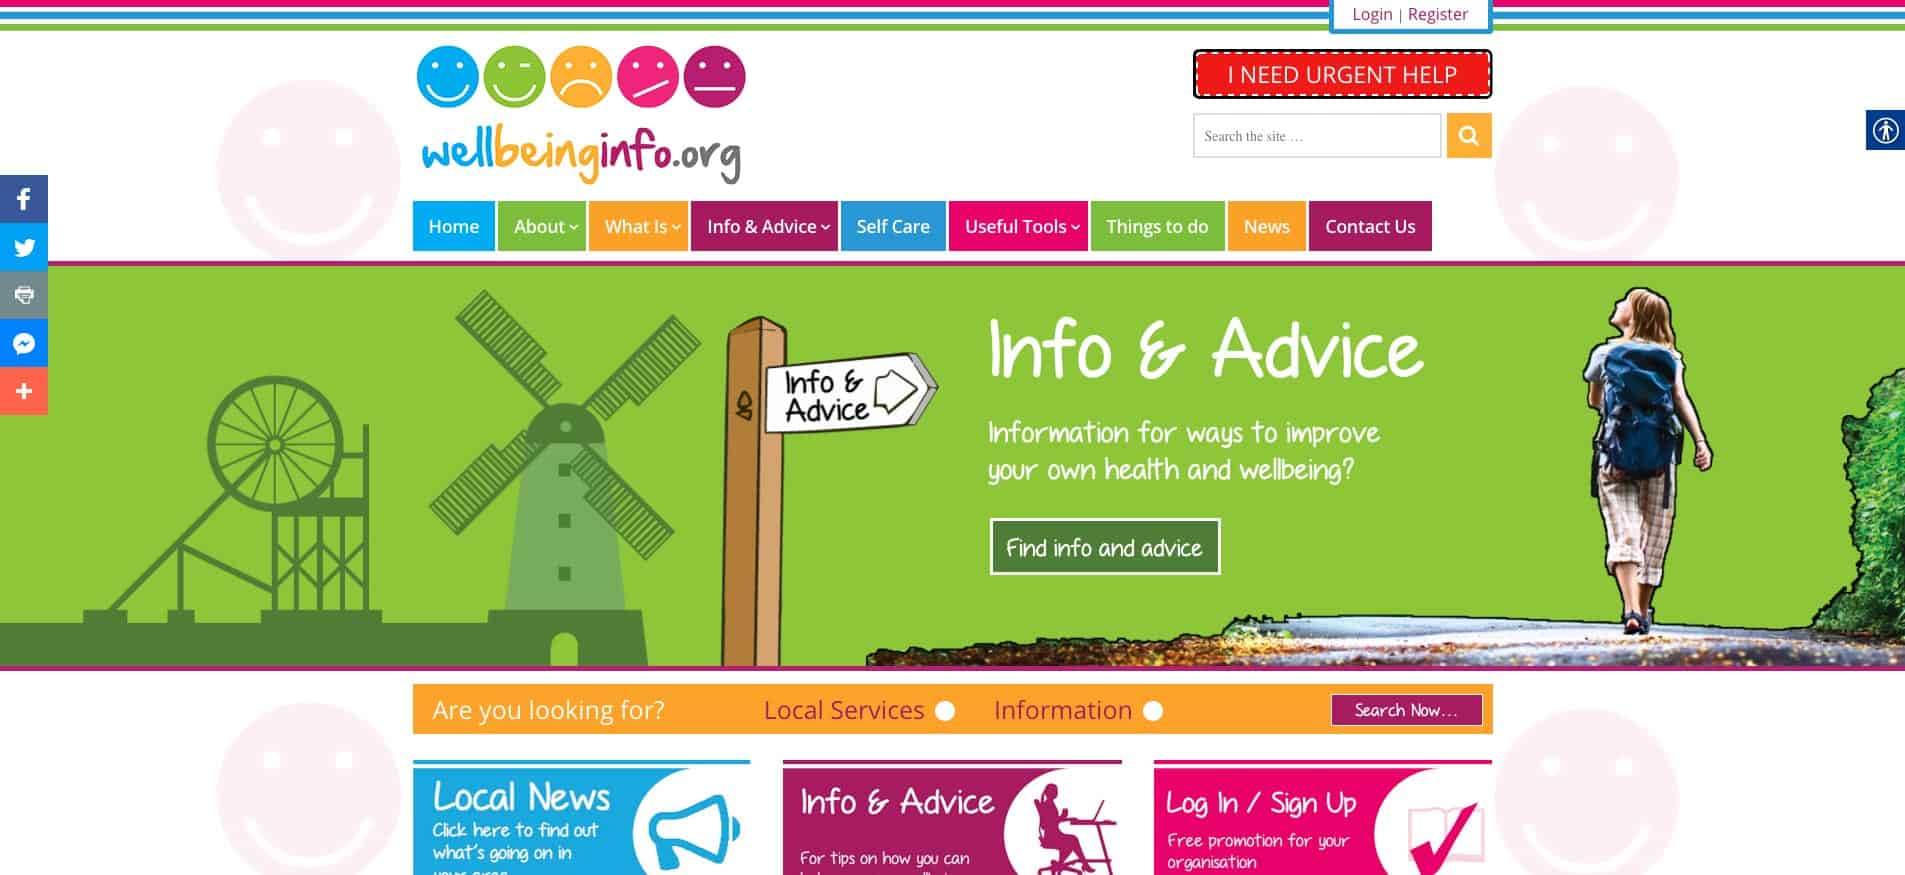 Wellbeinginfo.org